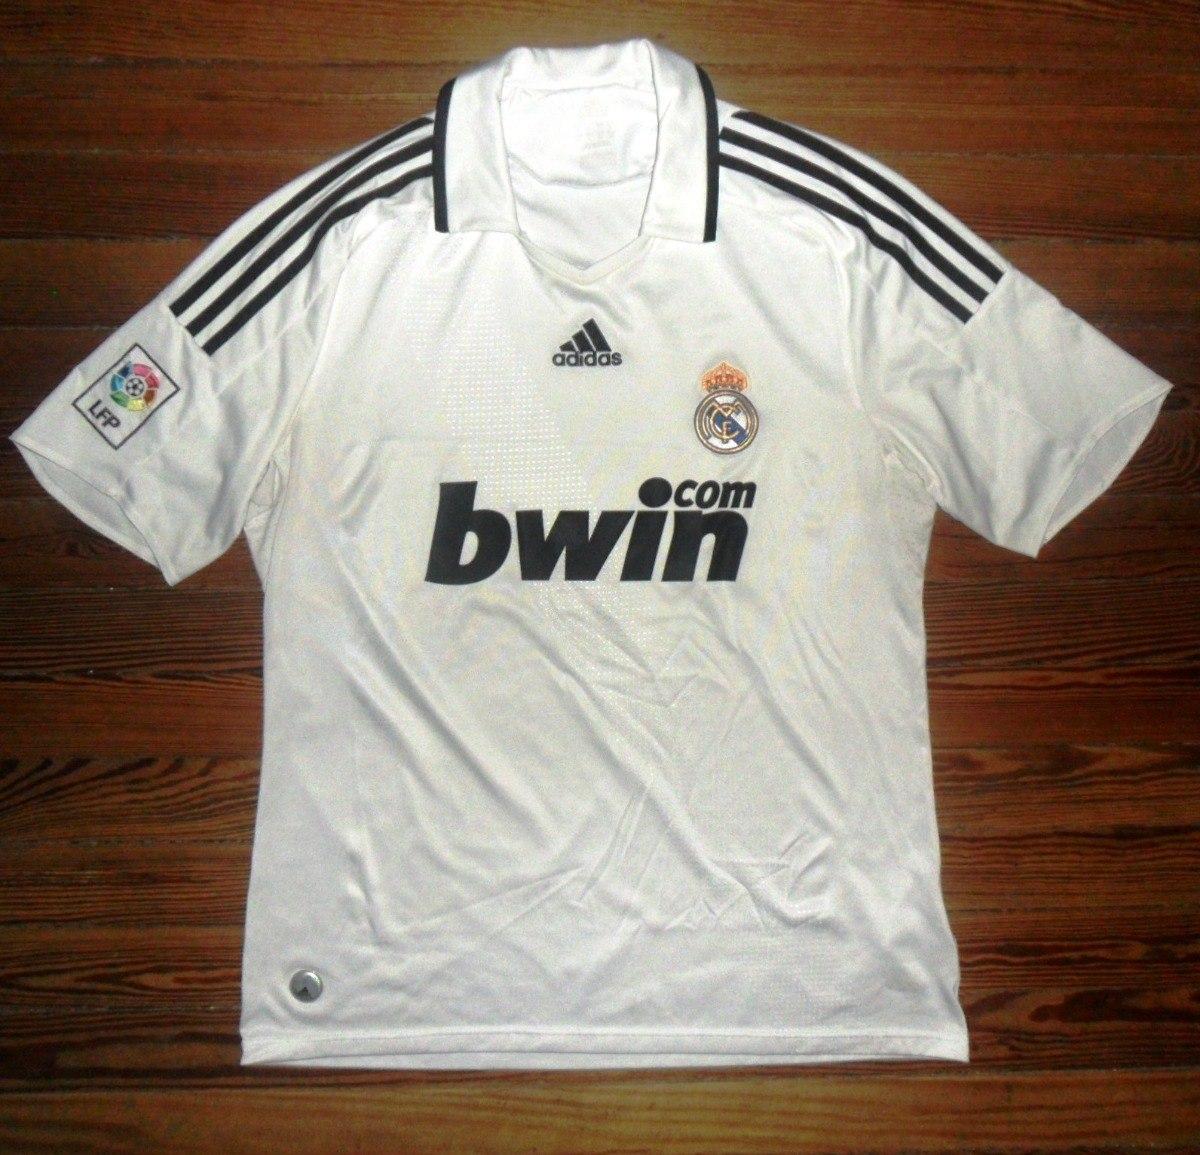 bab3b8ac4e011 camiseta real madrid 2008 talle l adidas. Cargando zoom.